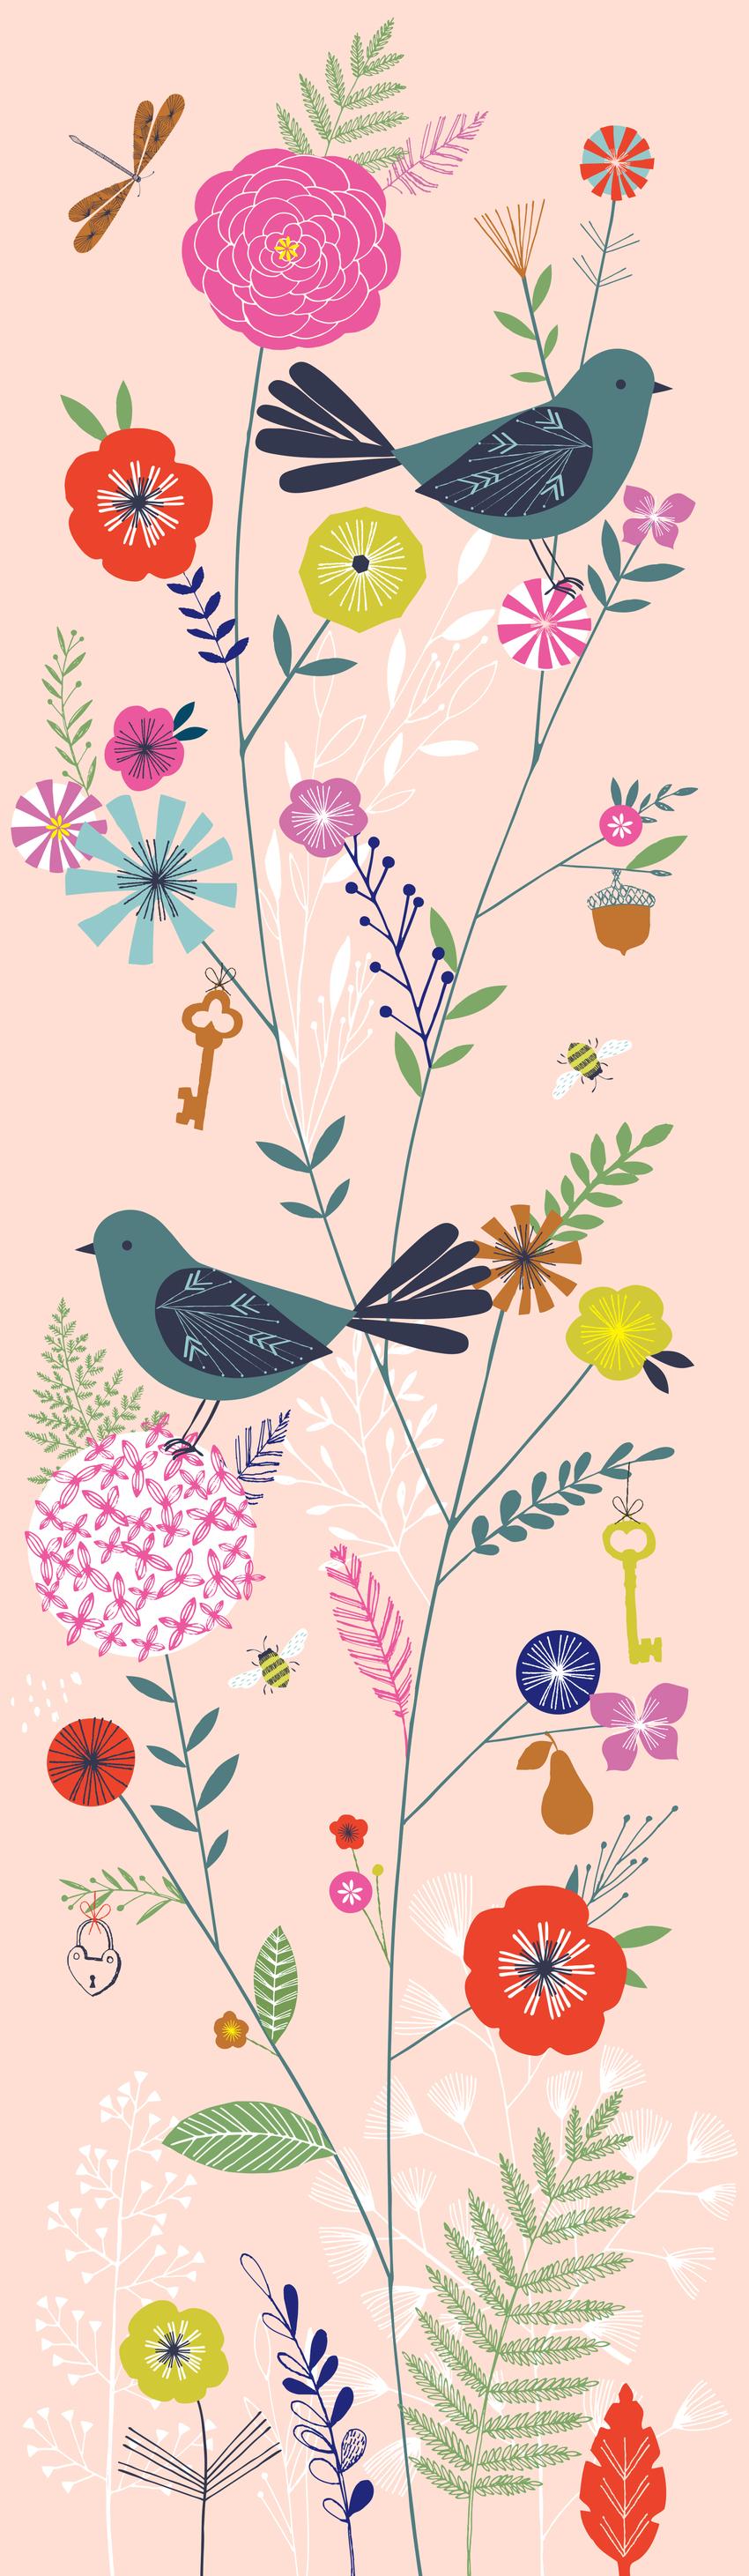 BethanJanine_Birds_Blooms_Grow_Chart.jpg